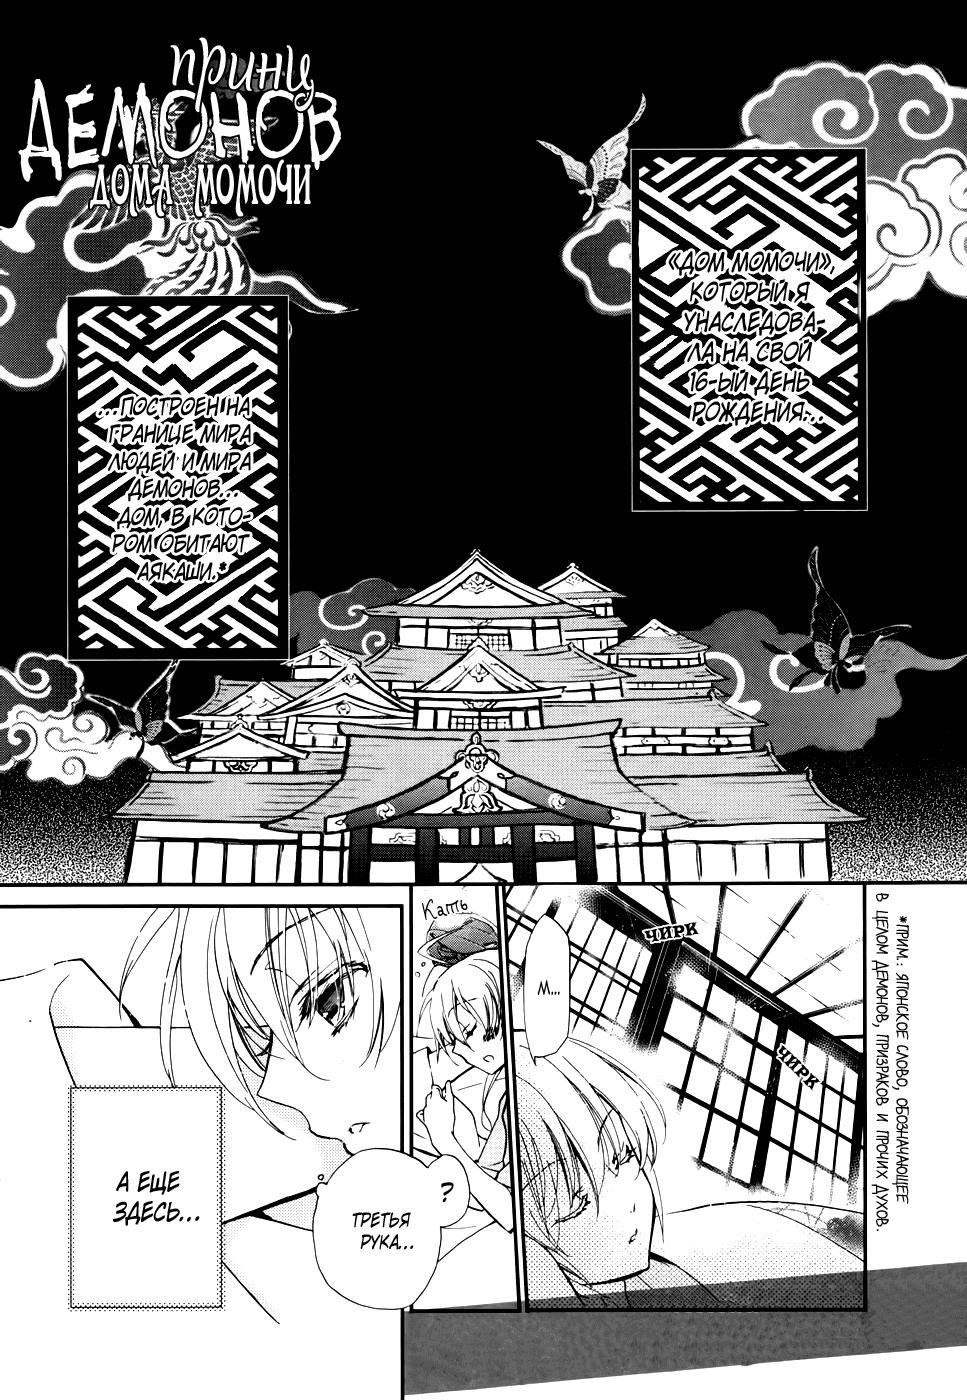 Манга Принц аякаси из дома Момоти - Глава 2 Страница 1